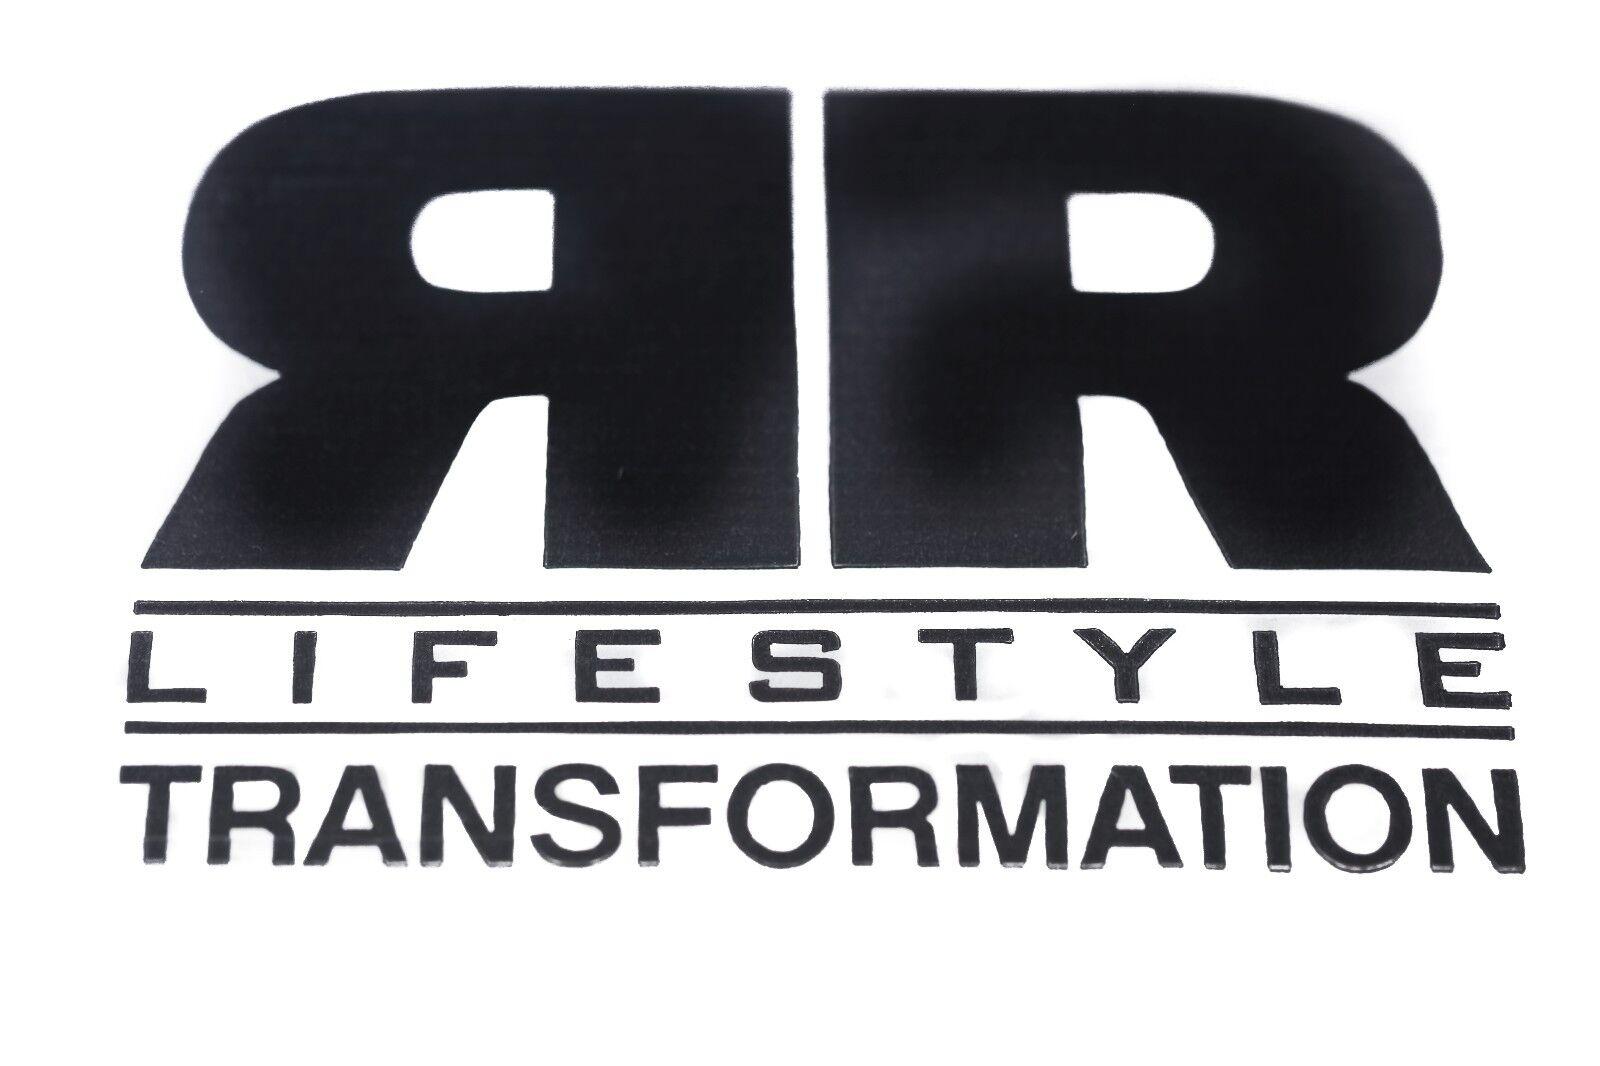 Robert Reams Lifestyle Transformation Yoga Ball Resistance Ropes Bands Balance Ball Yoga bc292d